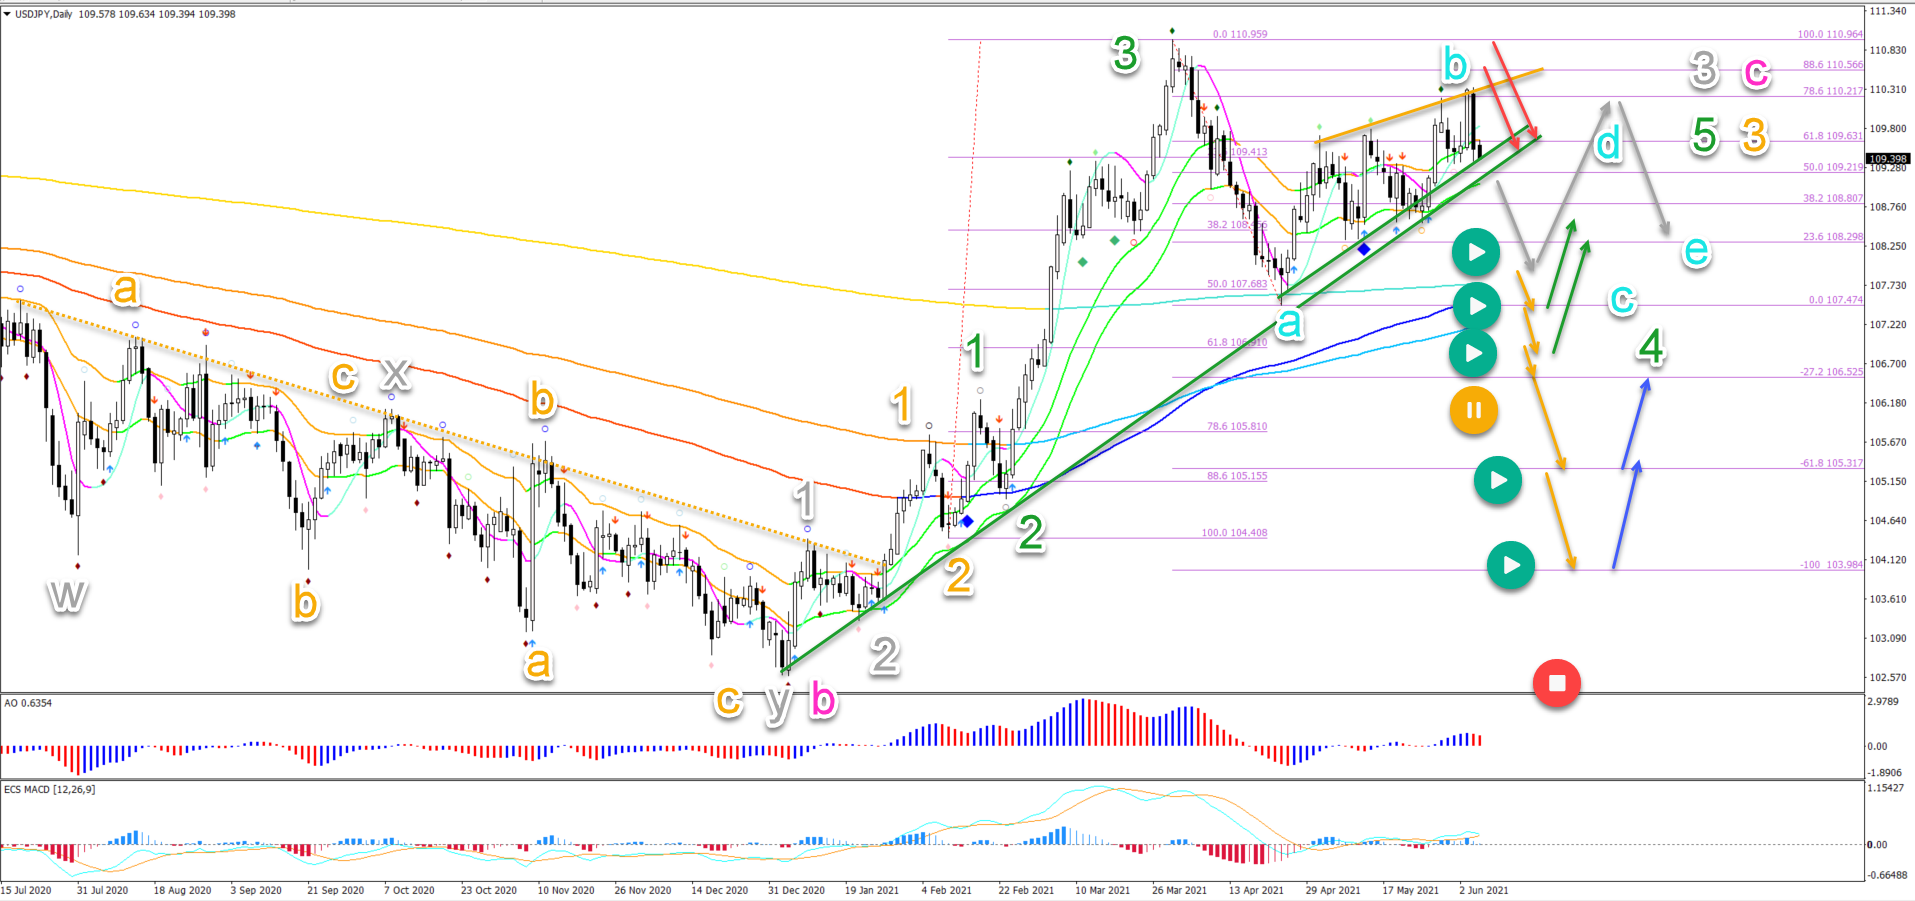 USD/JPY 07.06.2021 daily chart